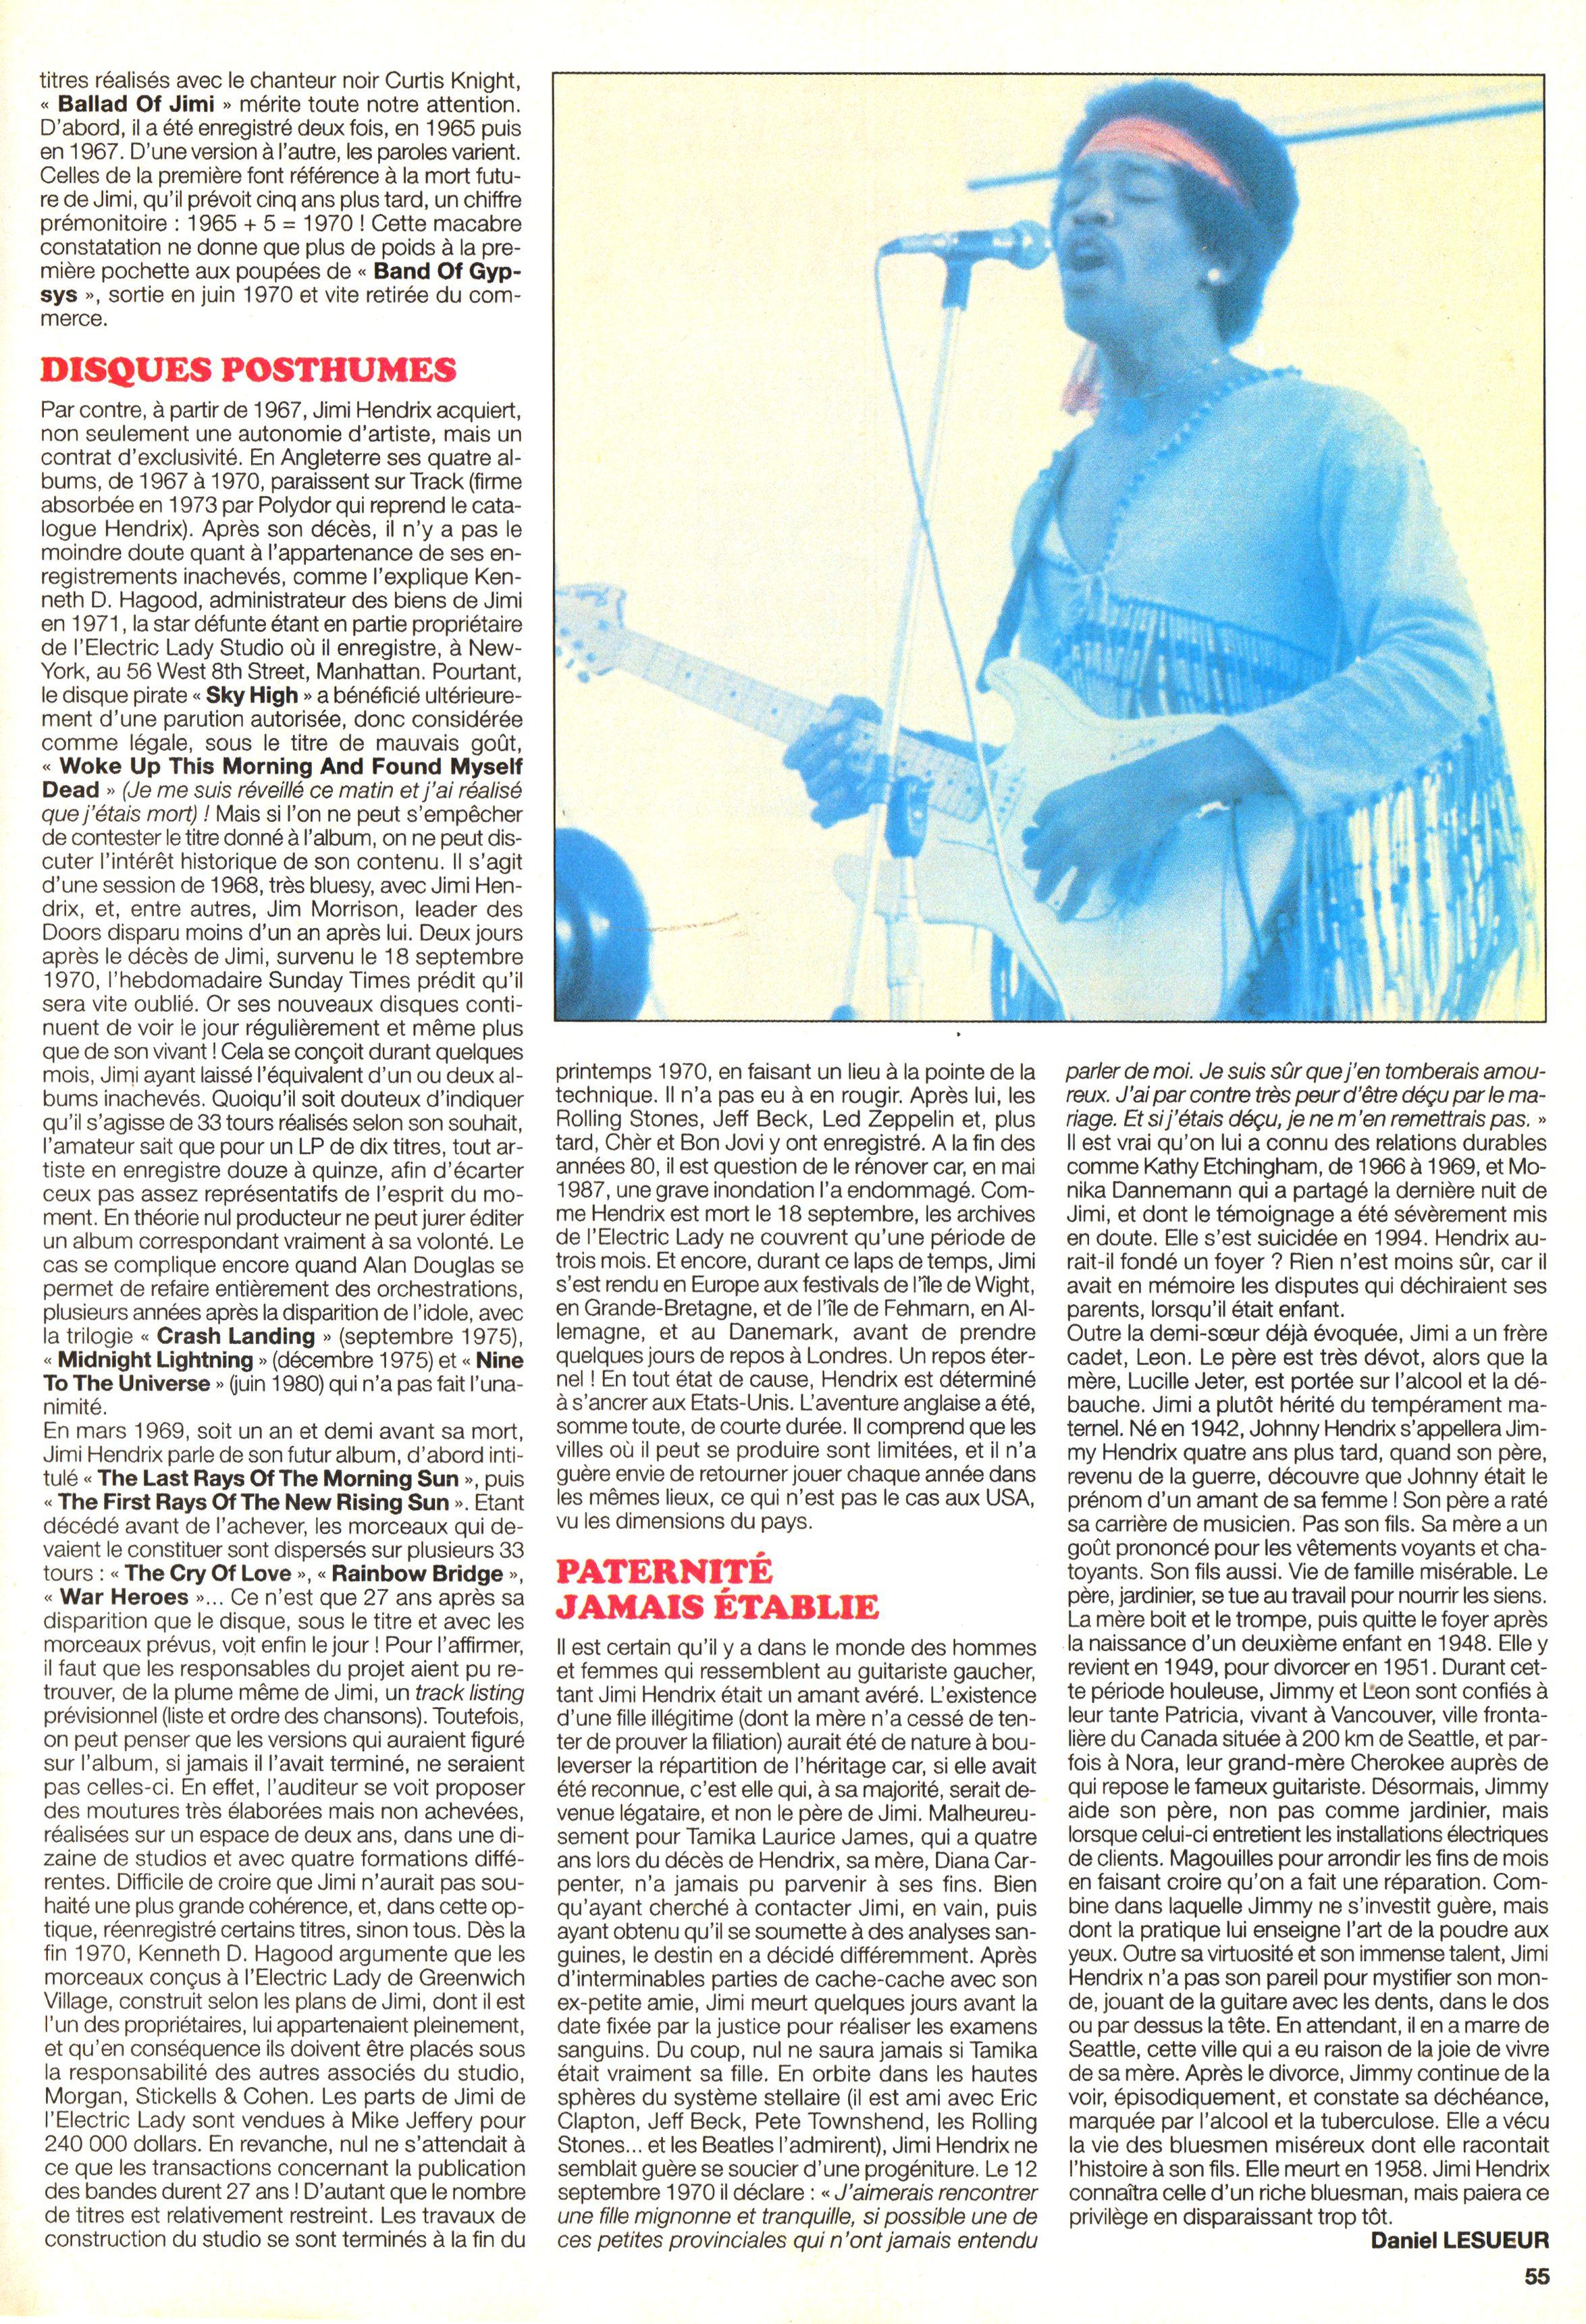 Magazines Français 1989 - 2014 JukeBoxSeptembre2000Page55